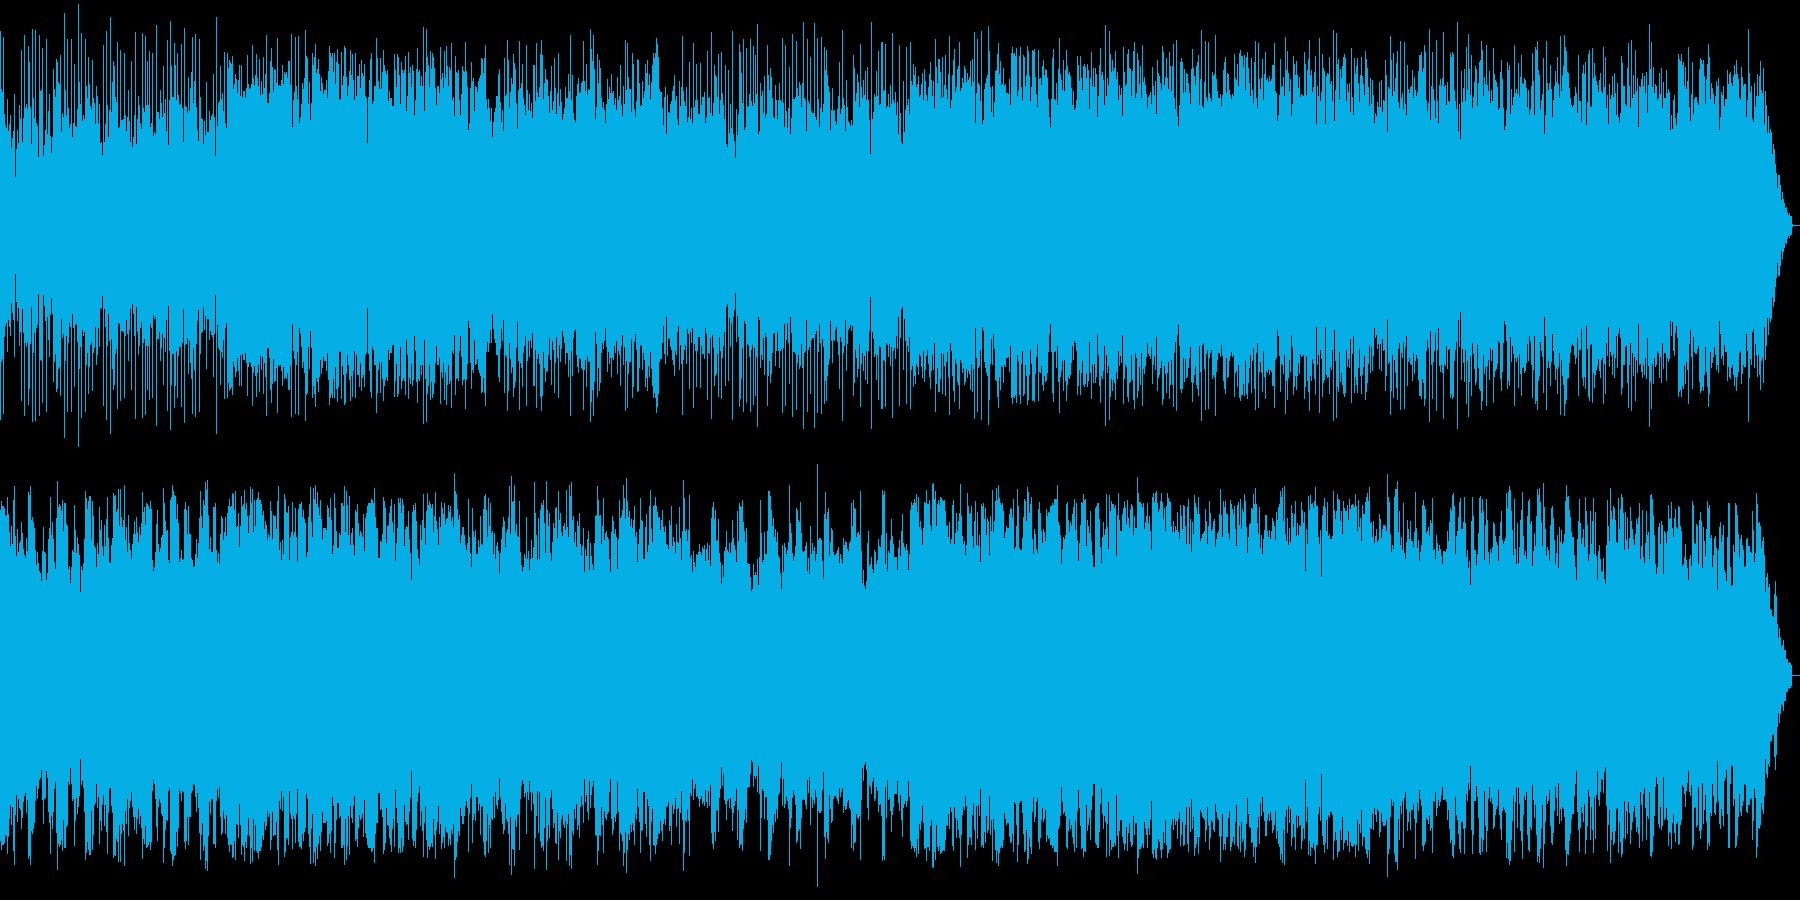 SFチックな環境音楽の再生済みの波形